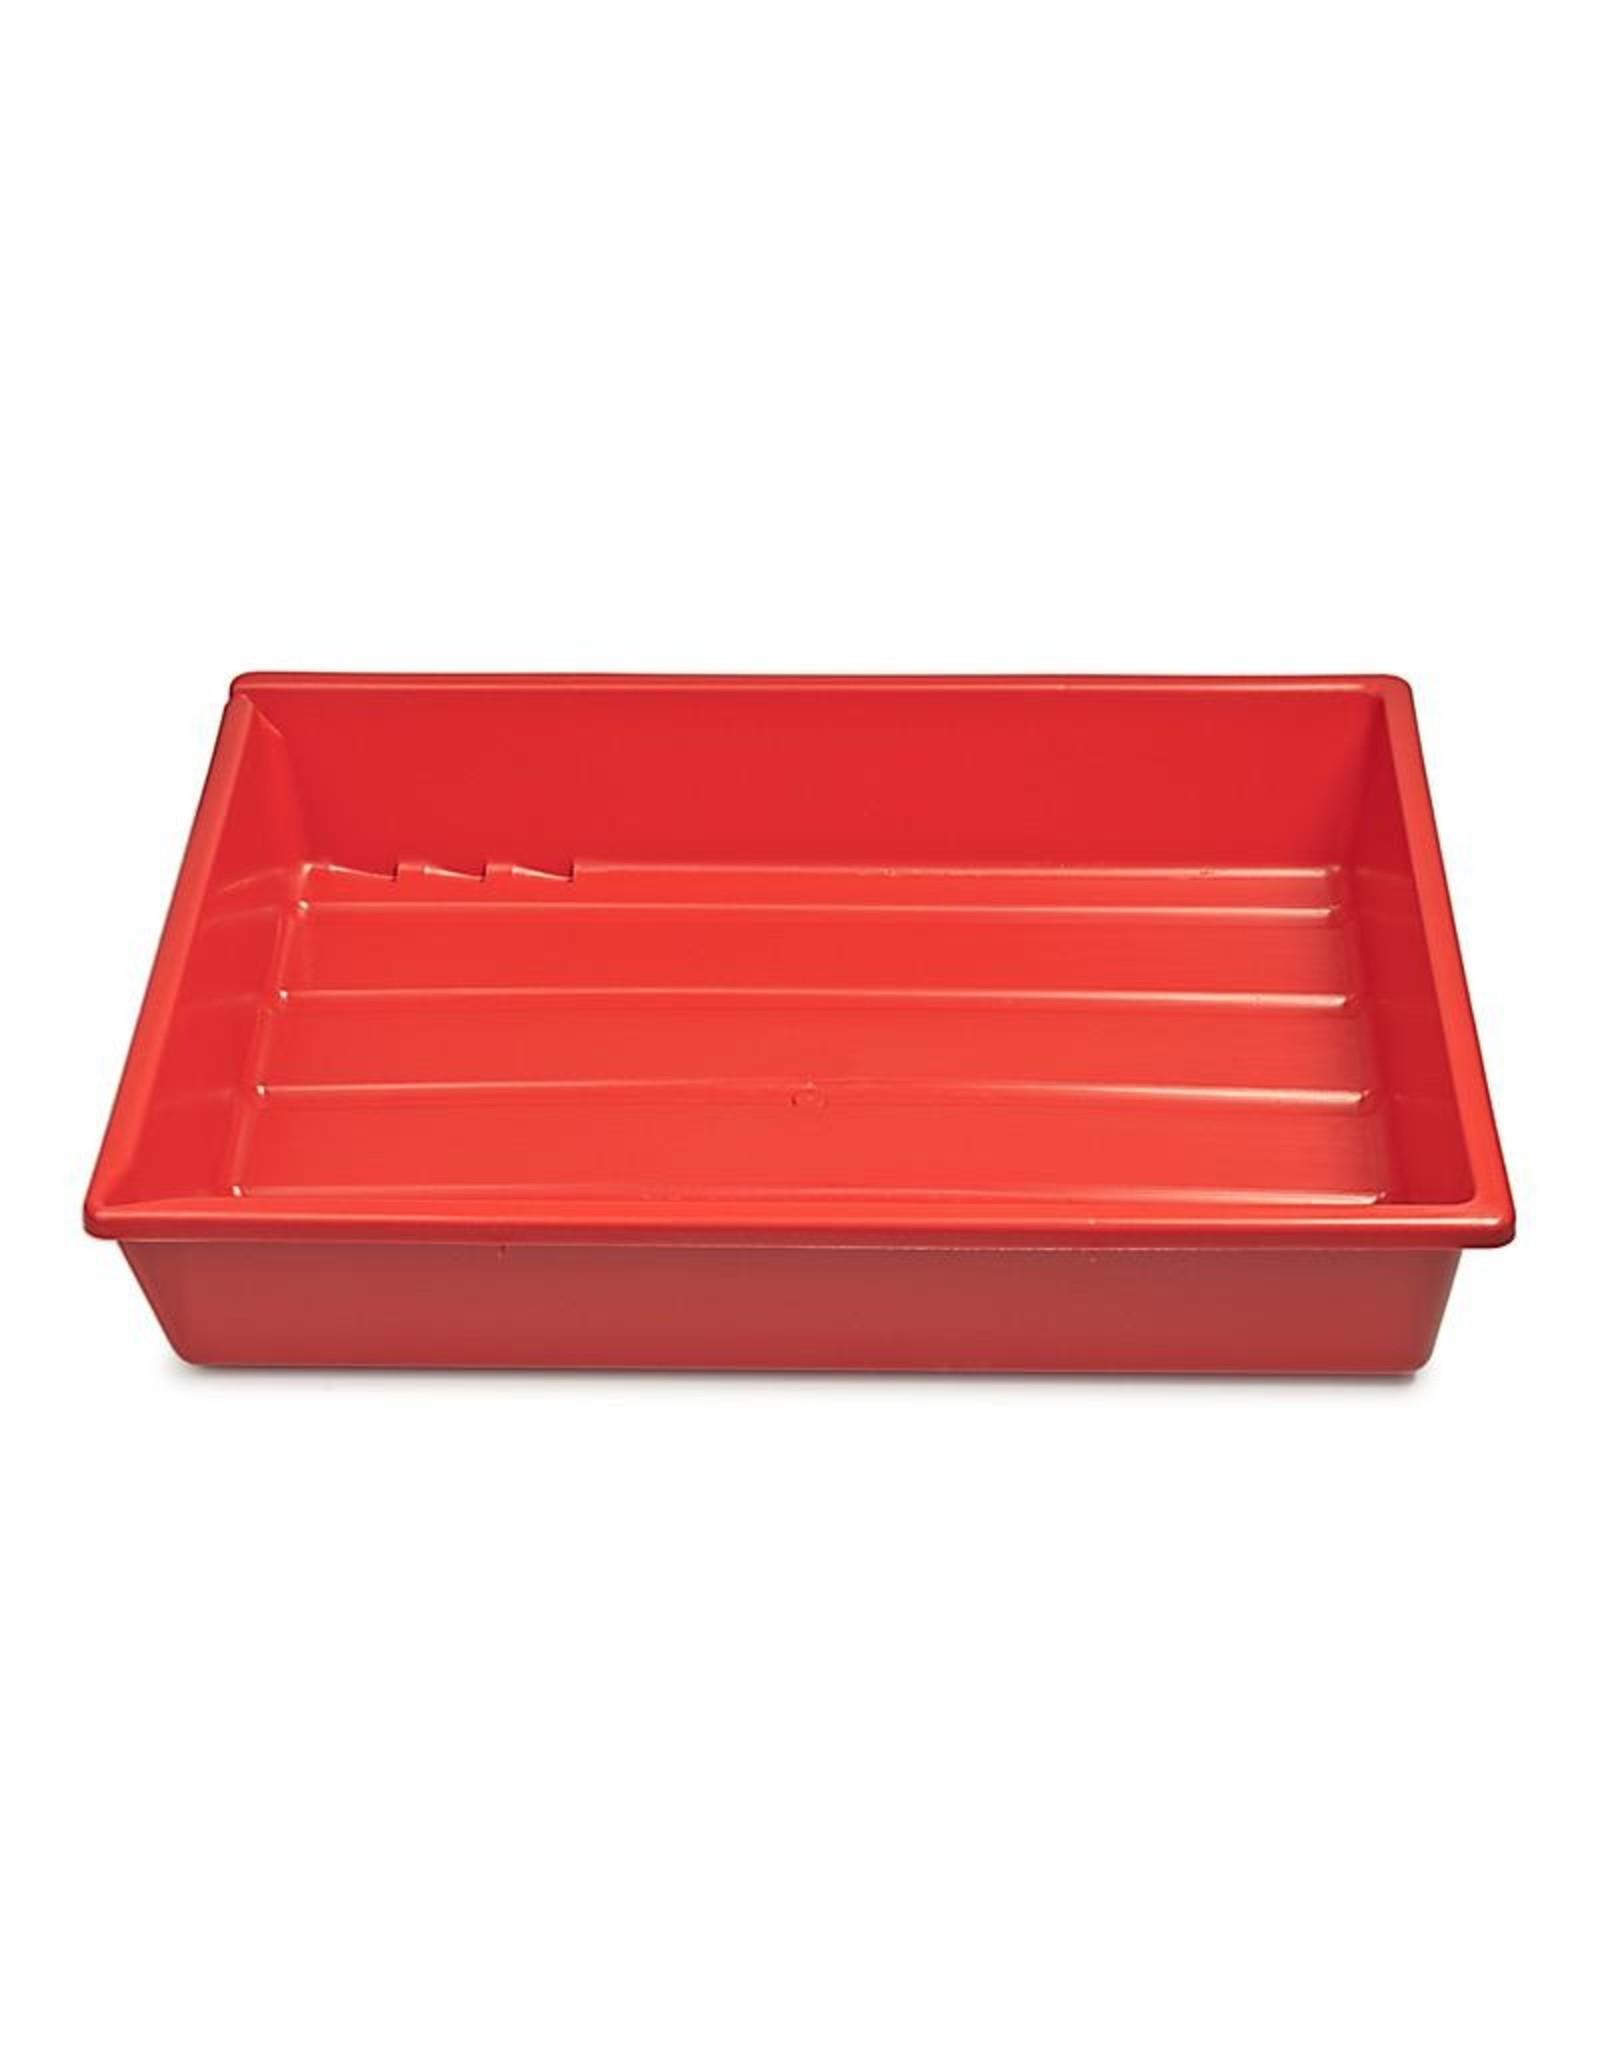 "Kaiser Kaiser Lab Tray, 30 x 40 cm (11,8 x 15,7""), red"